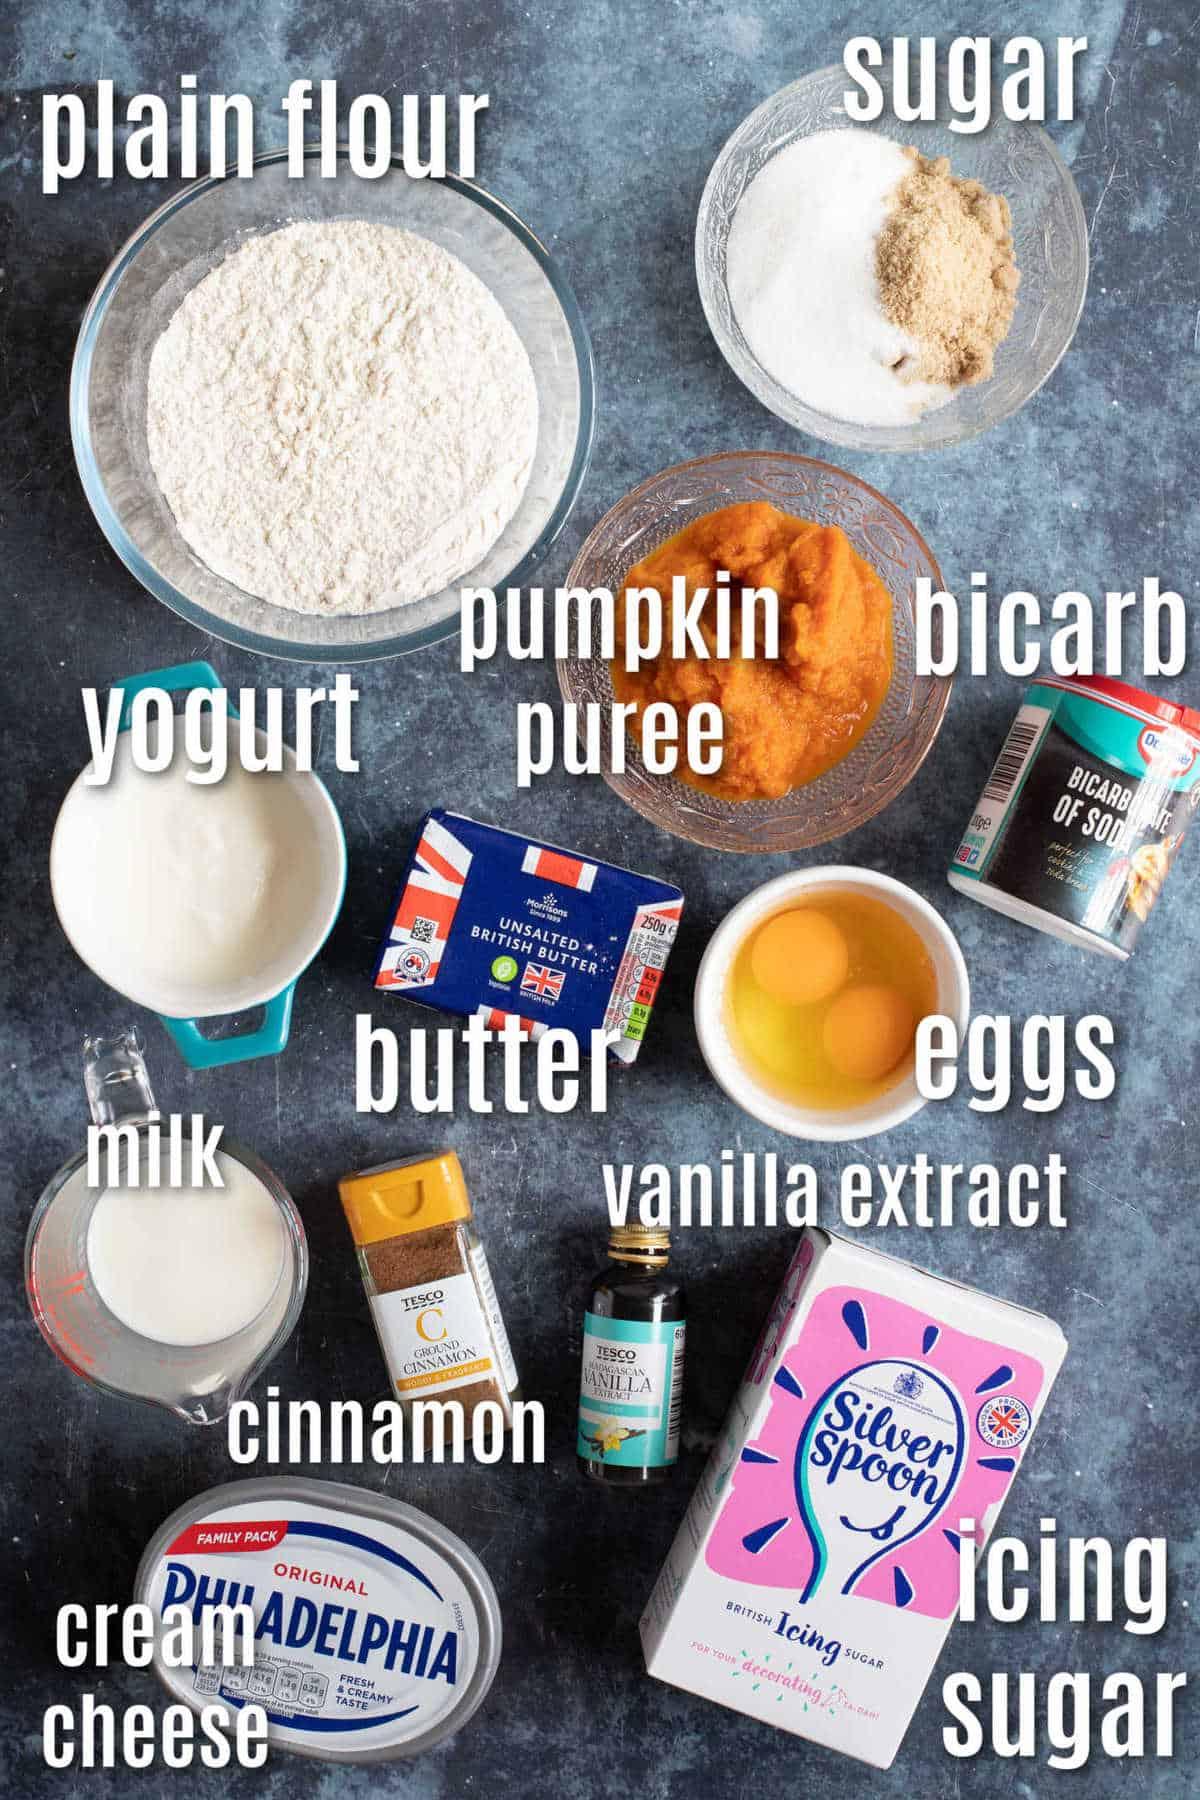 Ingredients for pumpkin muffins (UK ingredients).